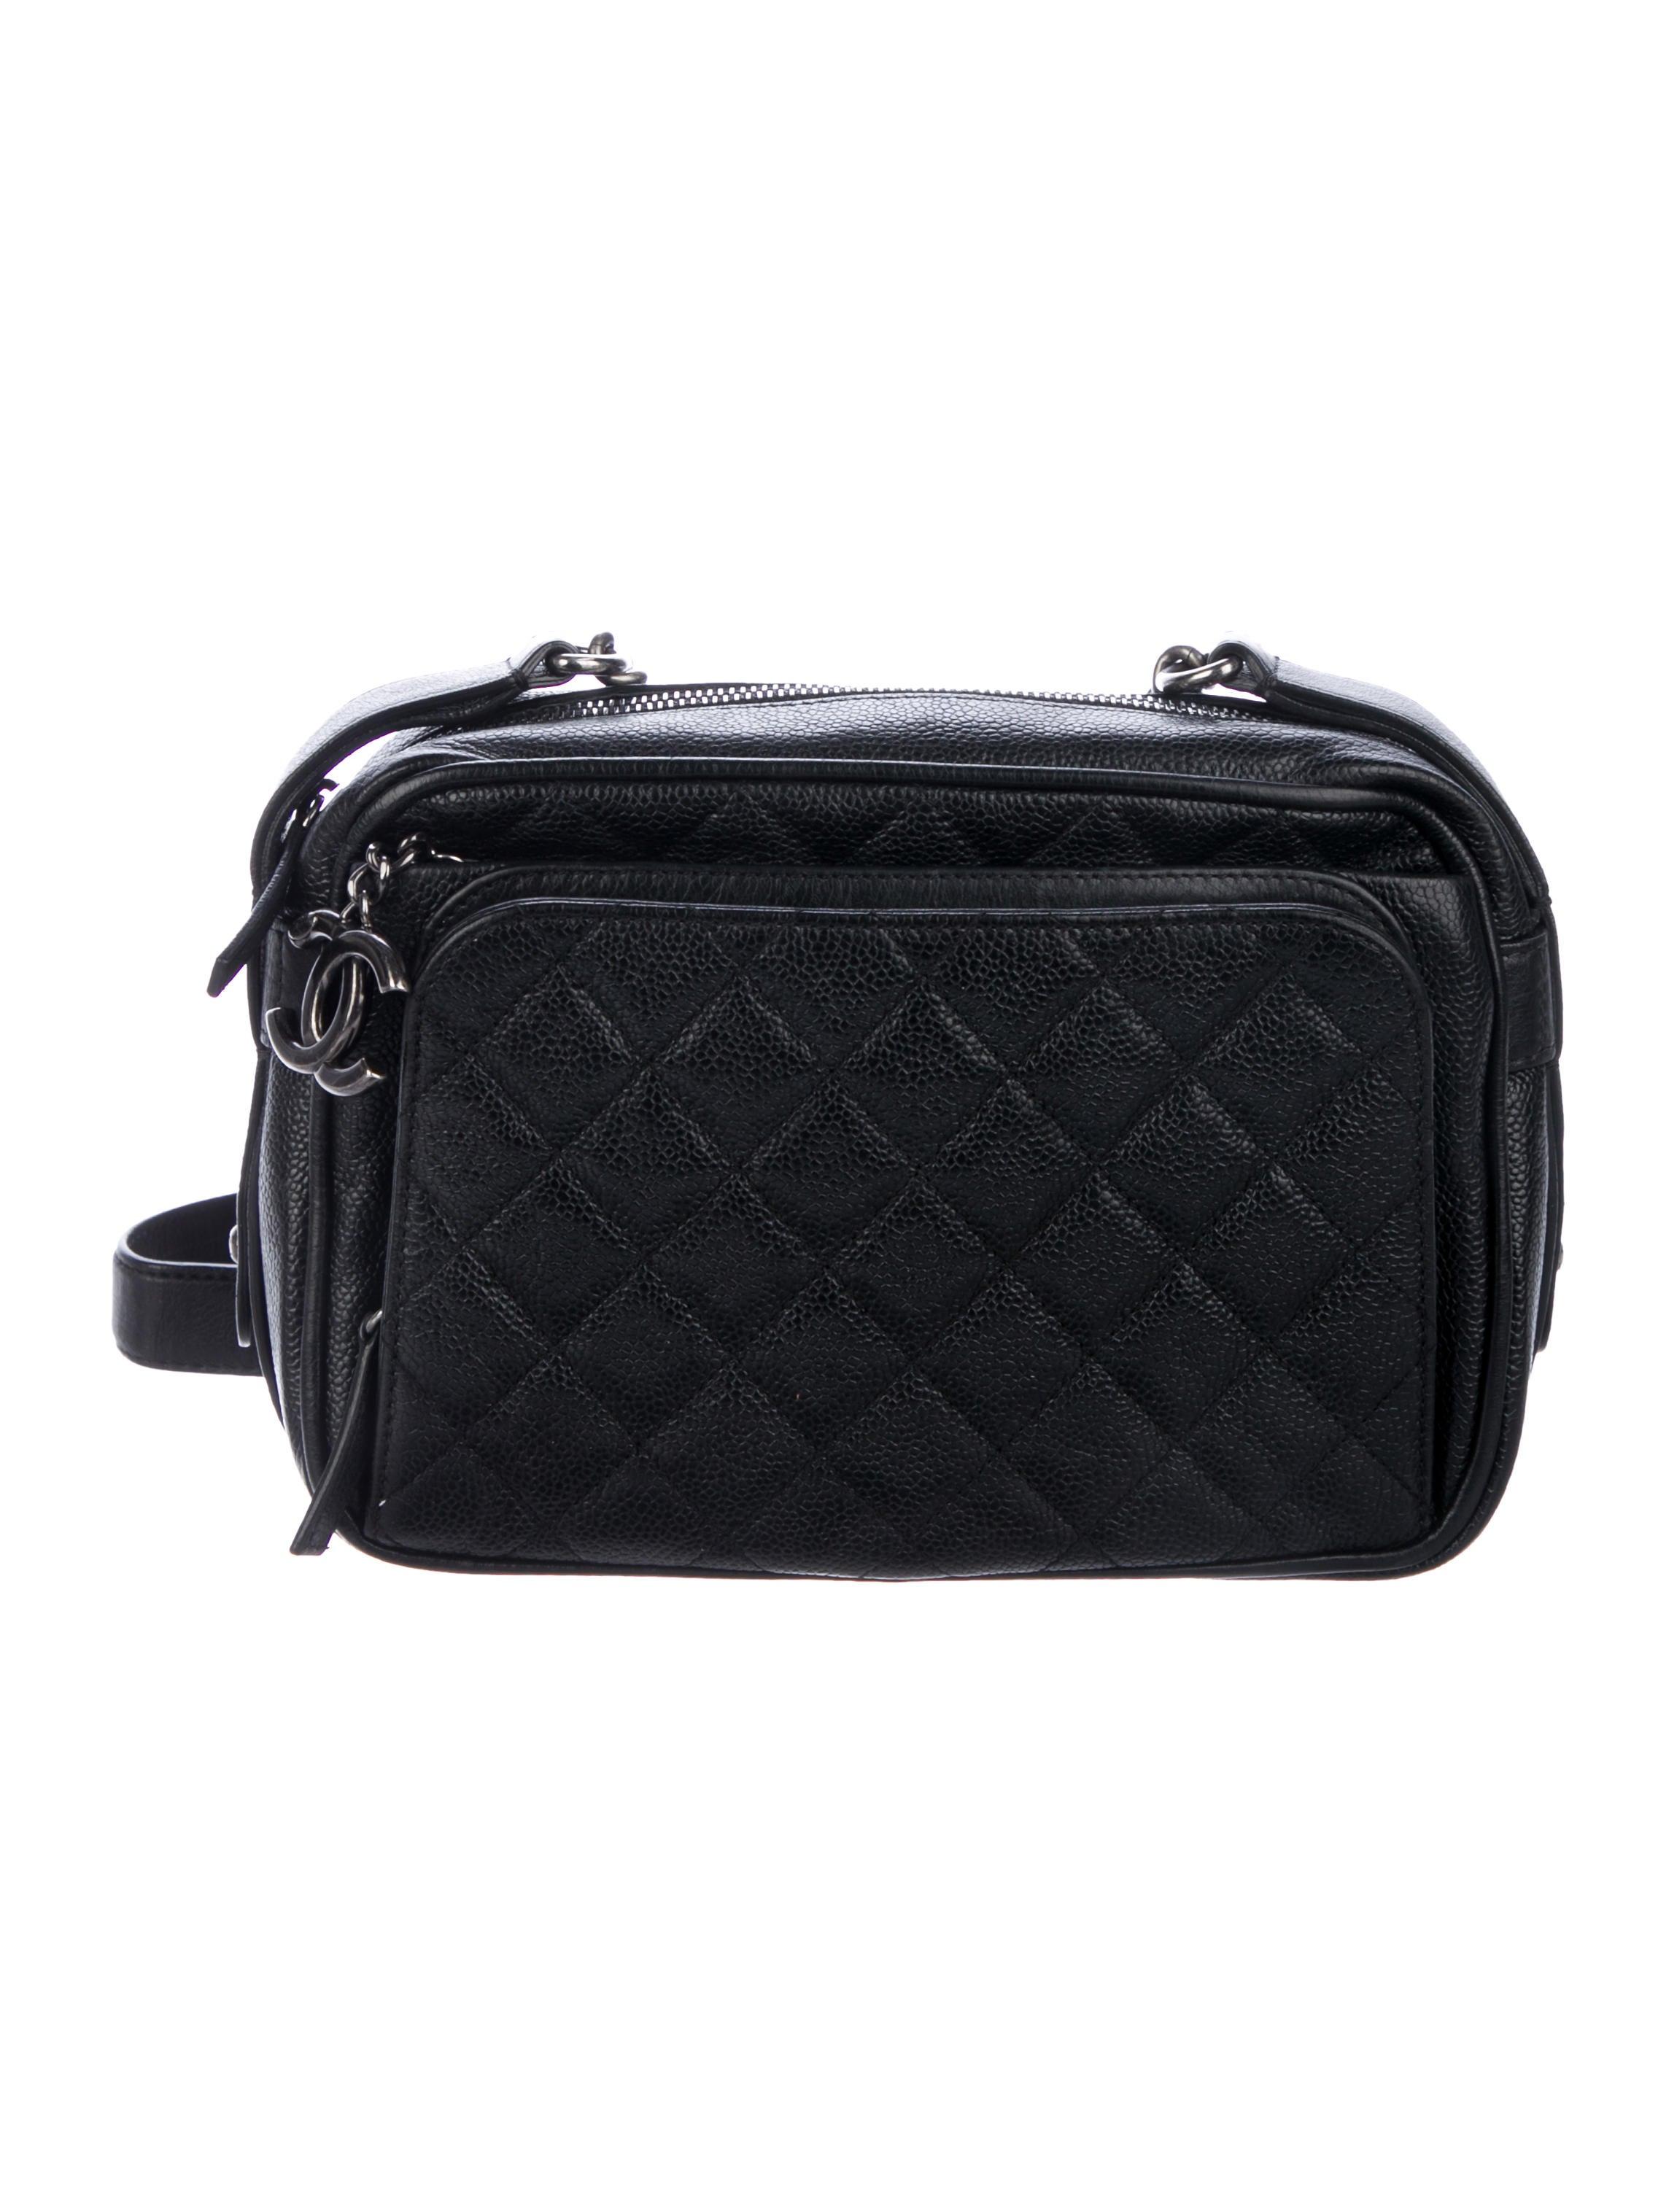 6331be46e4f6 Chanel Medium Business Trip Camera Bag - Handbags - CHA318065 | The ...